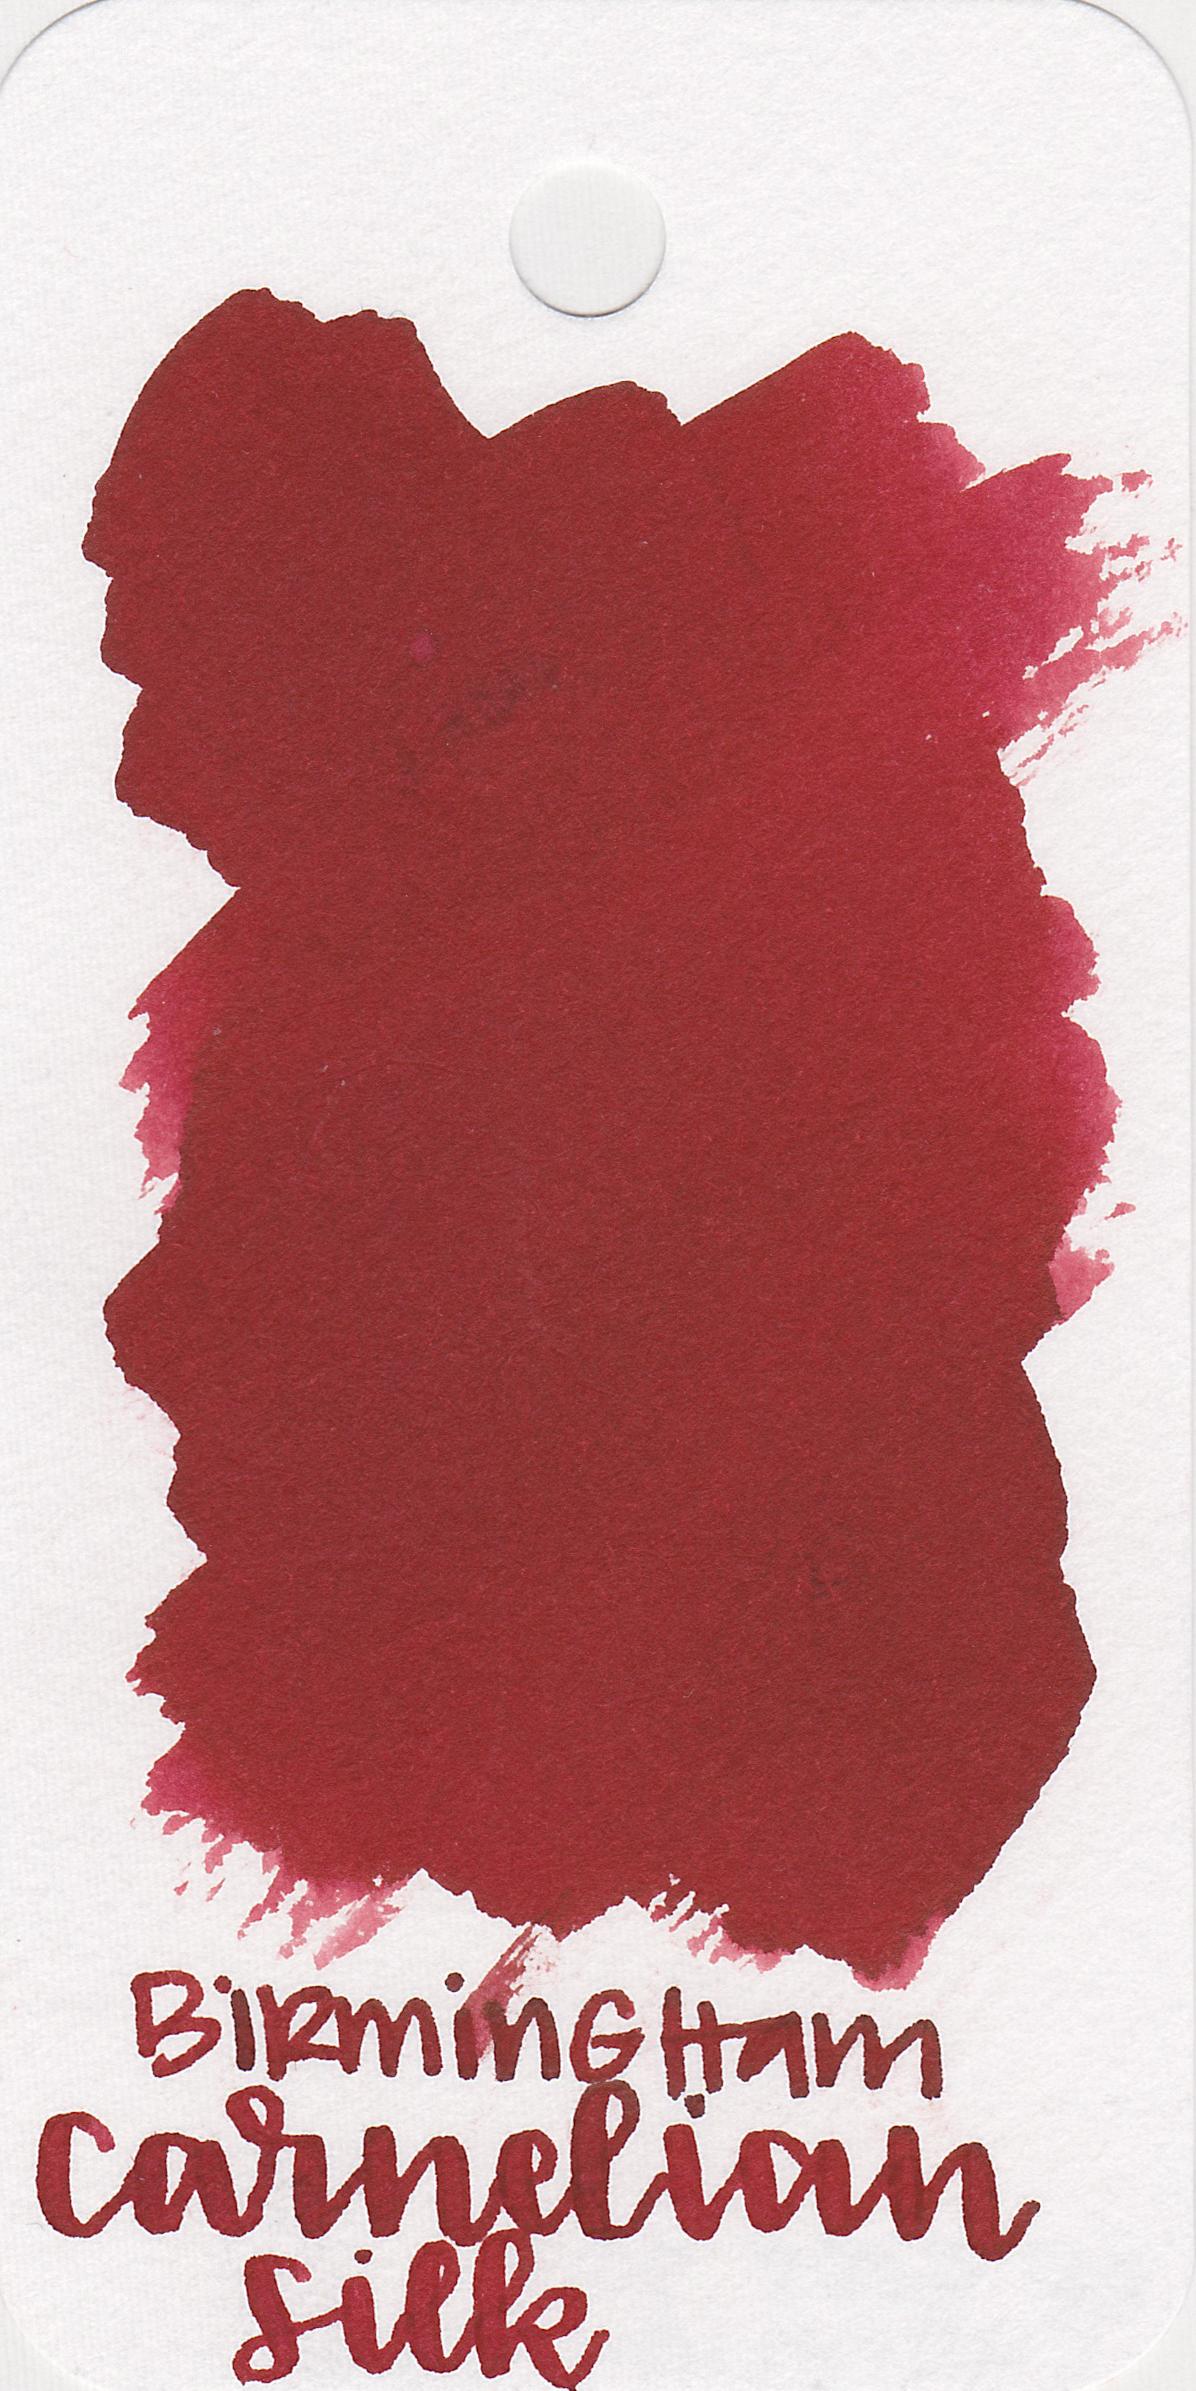 bp-carnelian-silk-1.jpg